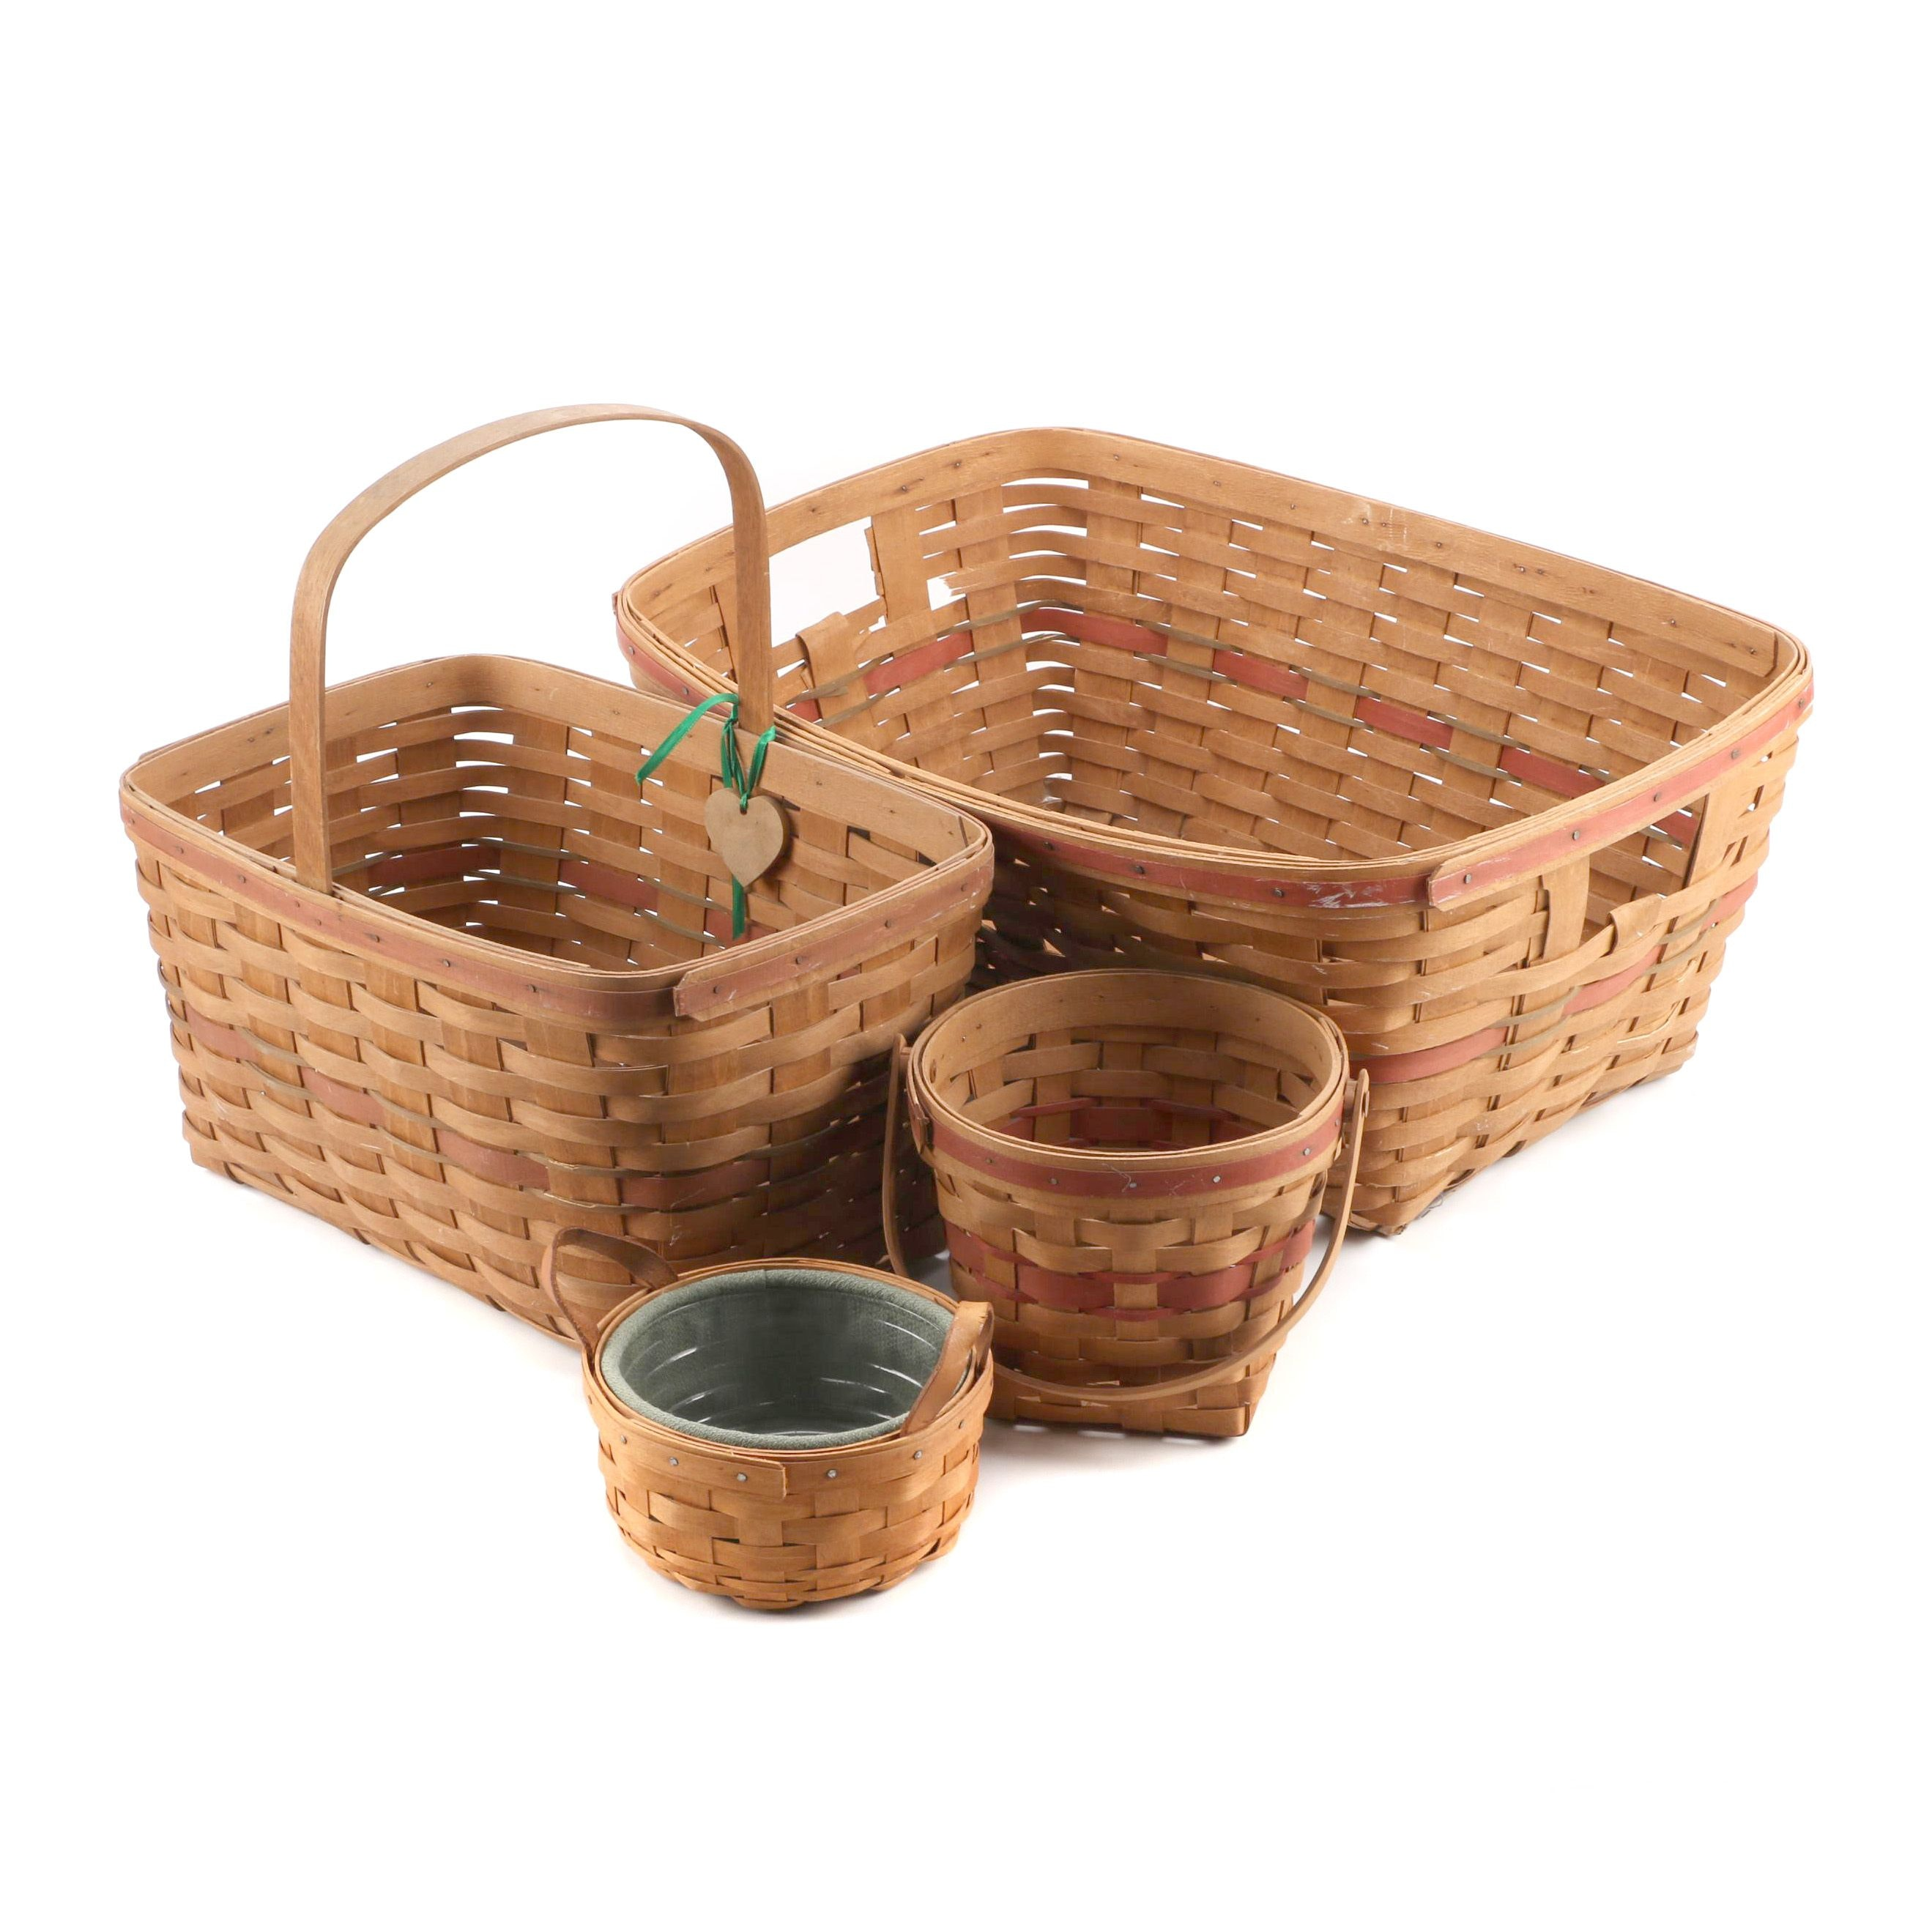 Assorted Handwoven Longaberger Baskets